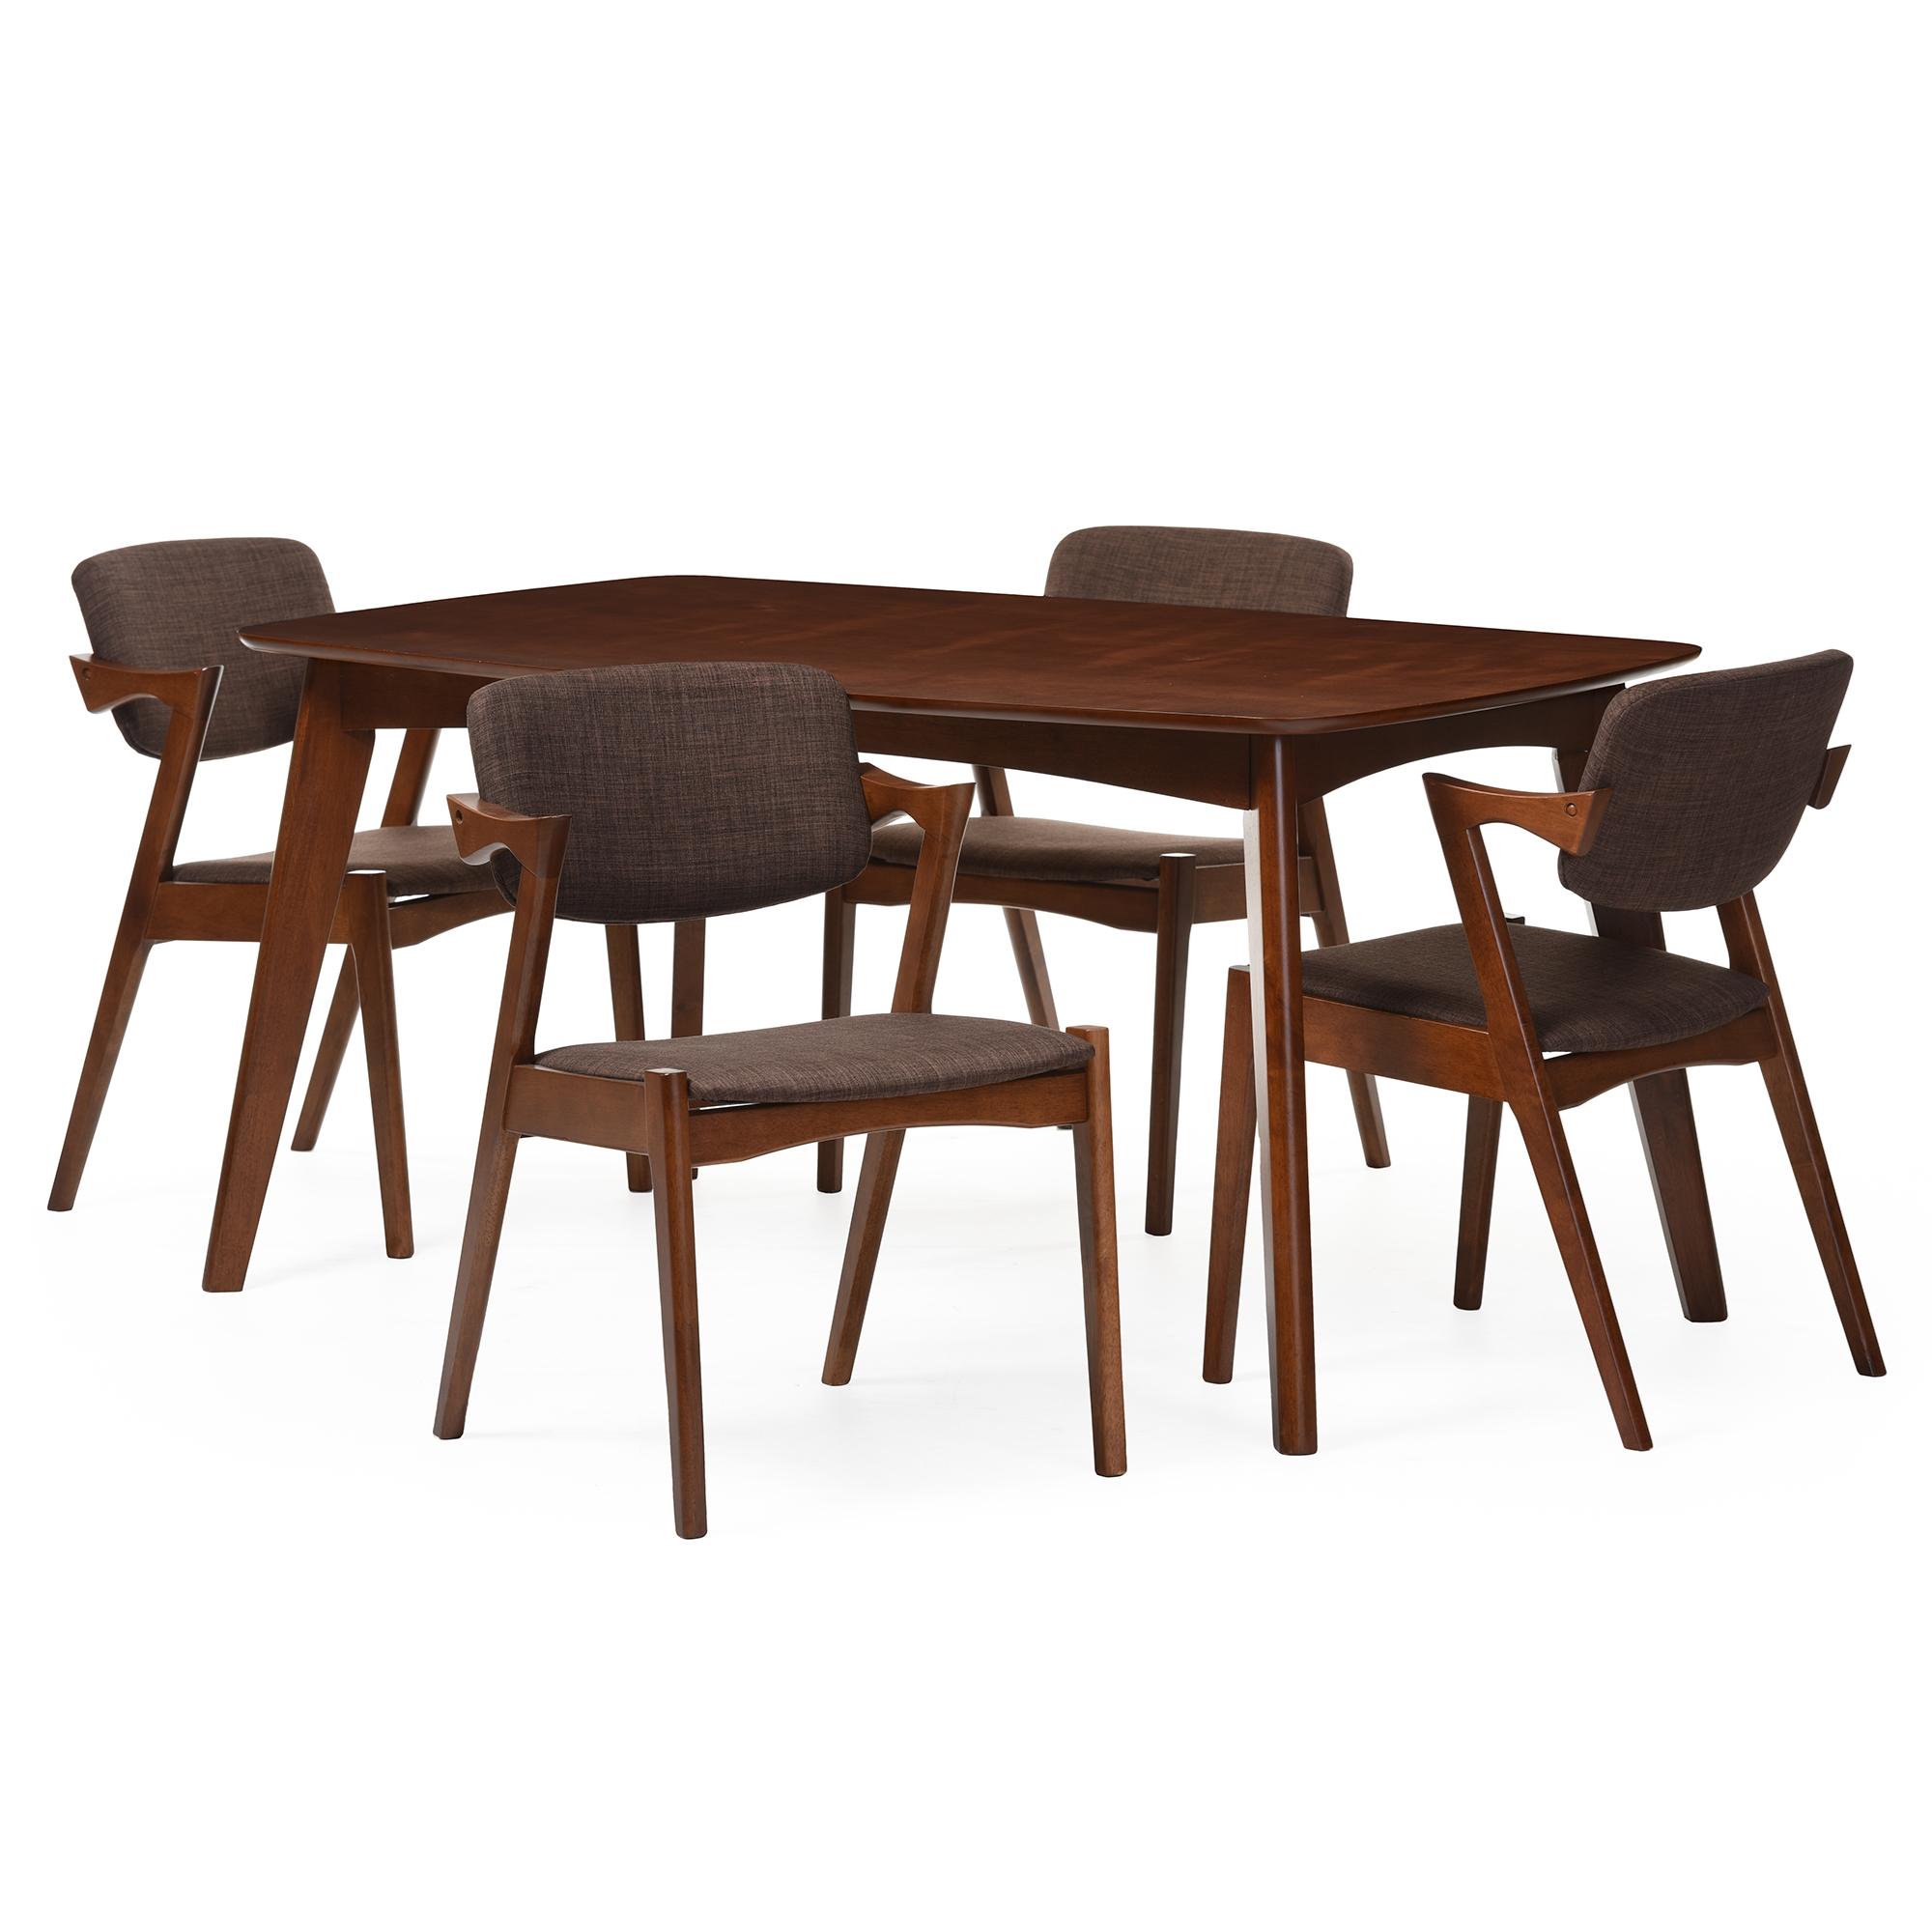 Baxton Studio | Wholesale Dining Sets | Wholesale Dining Room ...